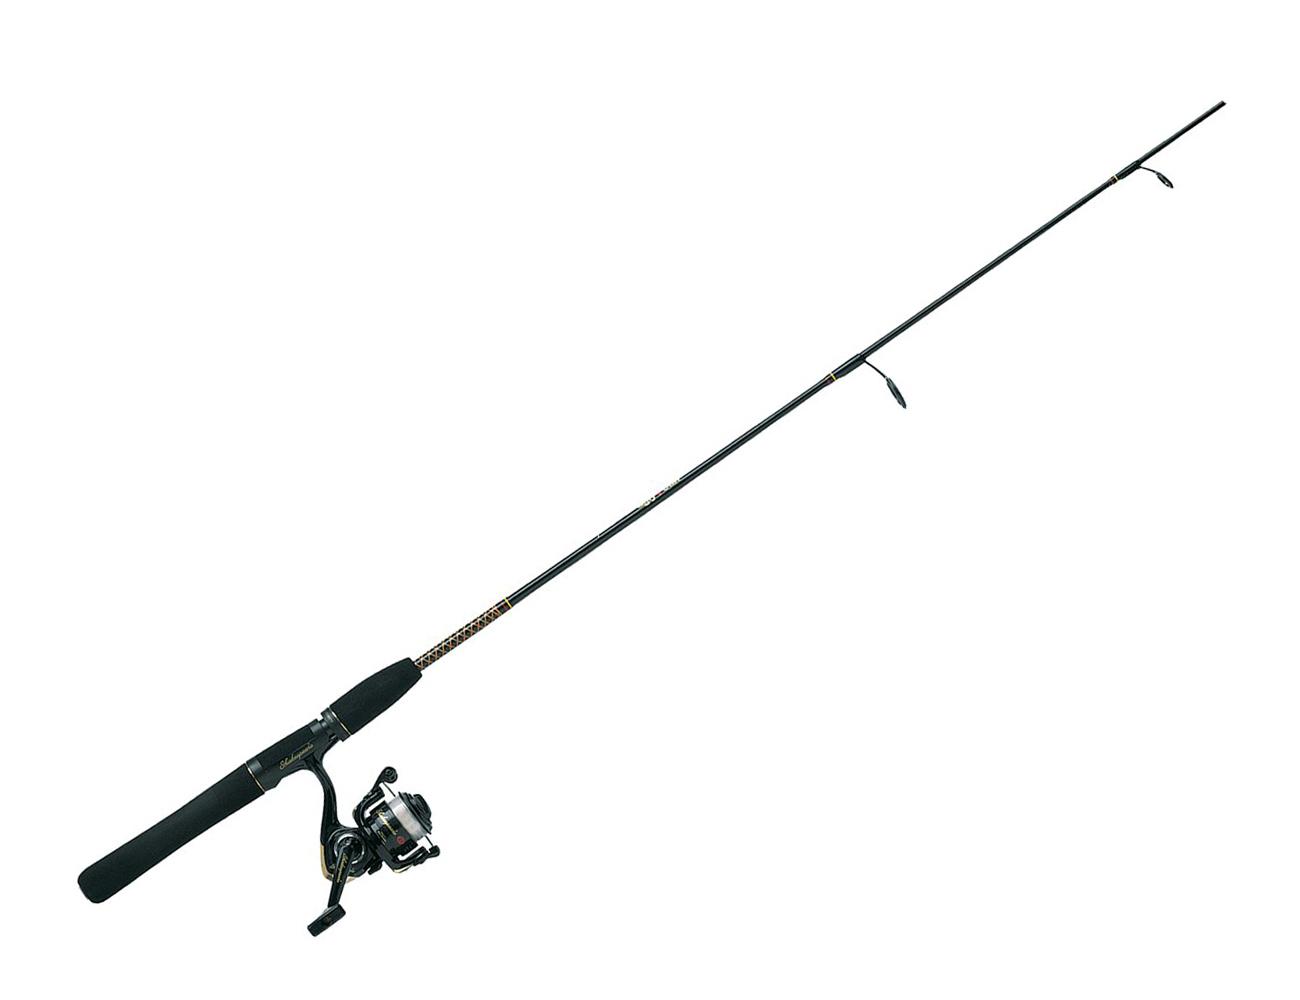 Fishing Pole Fishing Rod Clipart Kiaavto-Fishing pole fishing rod clipart kiaavto 2 image-10